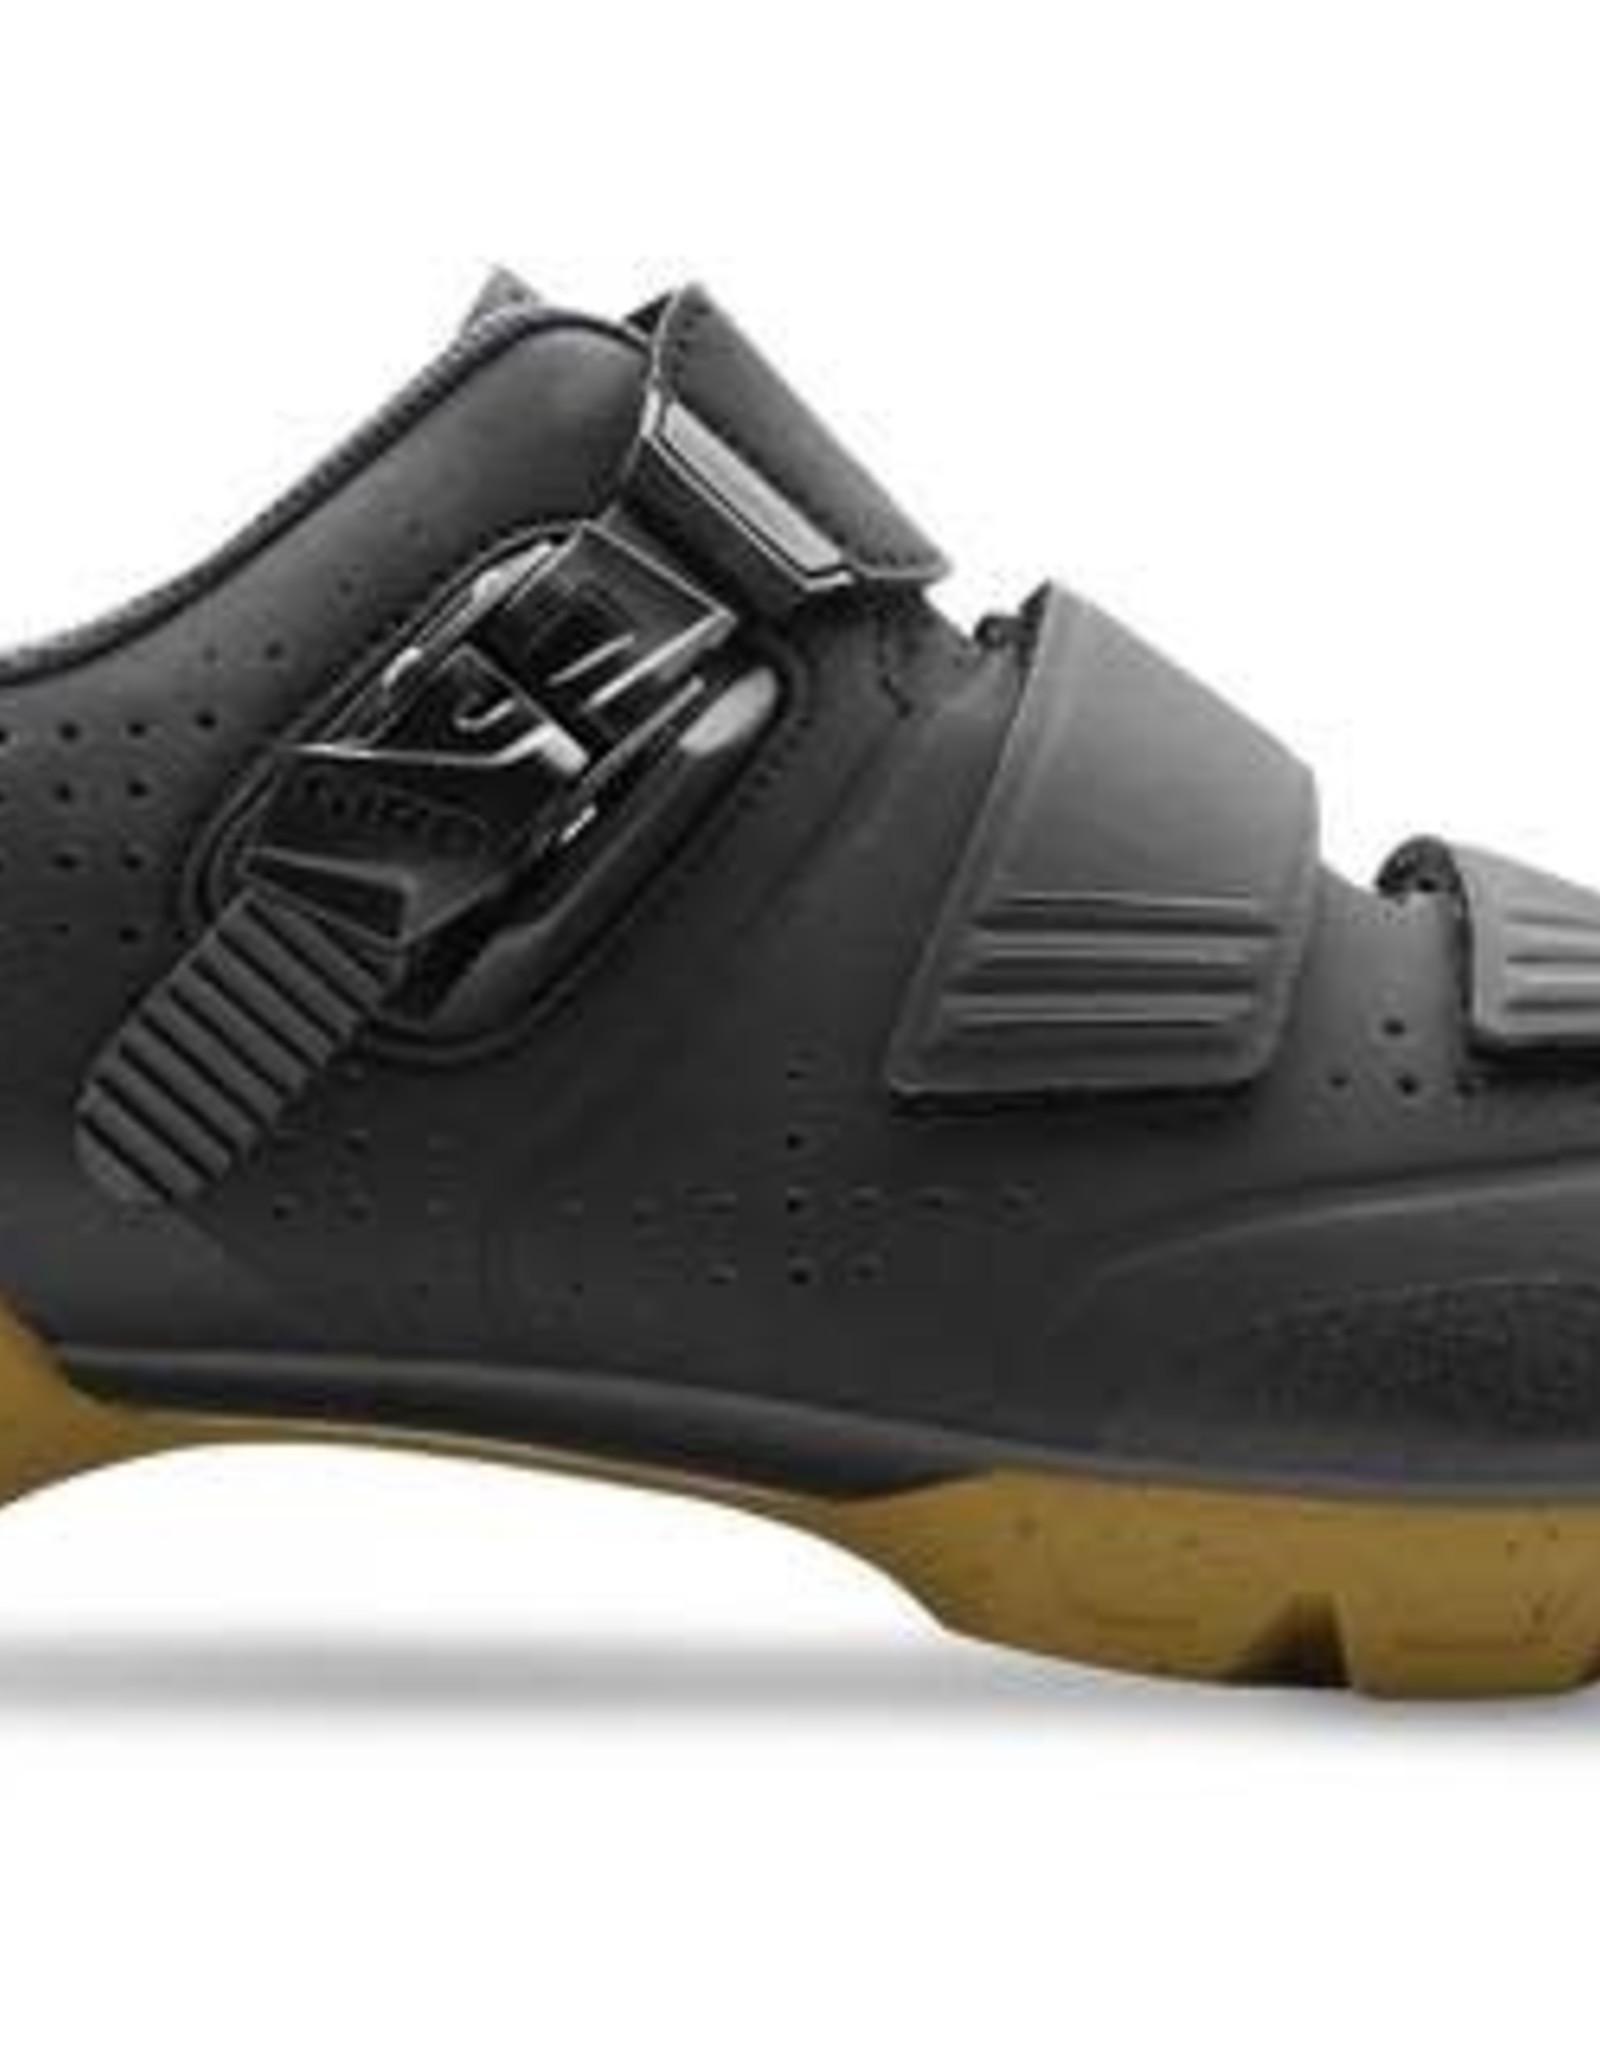 Giro GIRO Bike Shoes PRIVATEER R